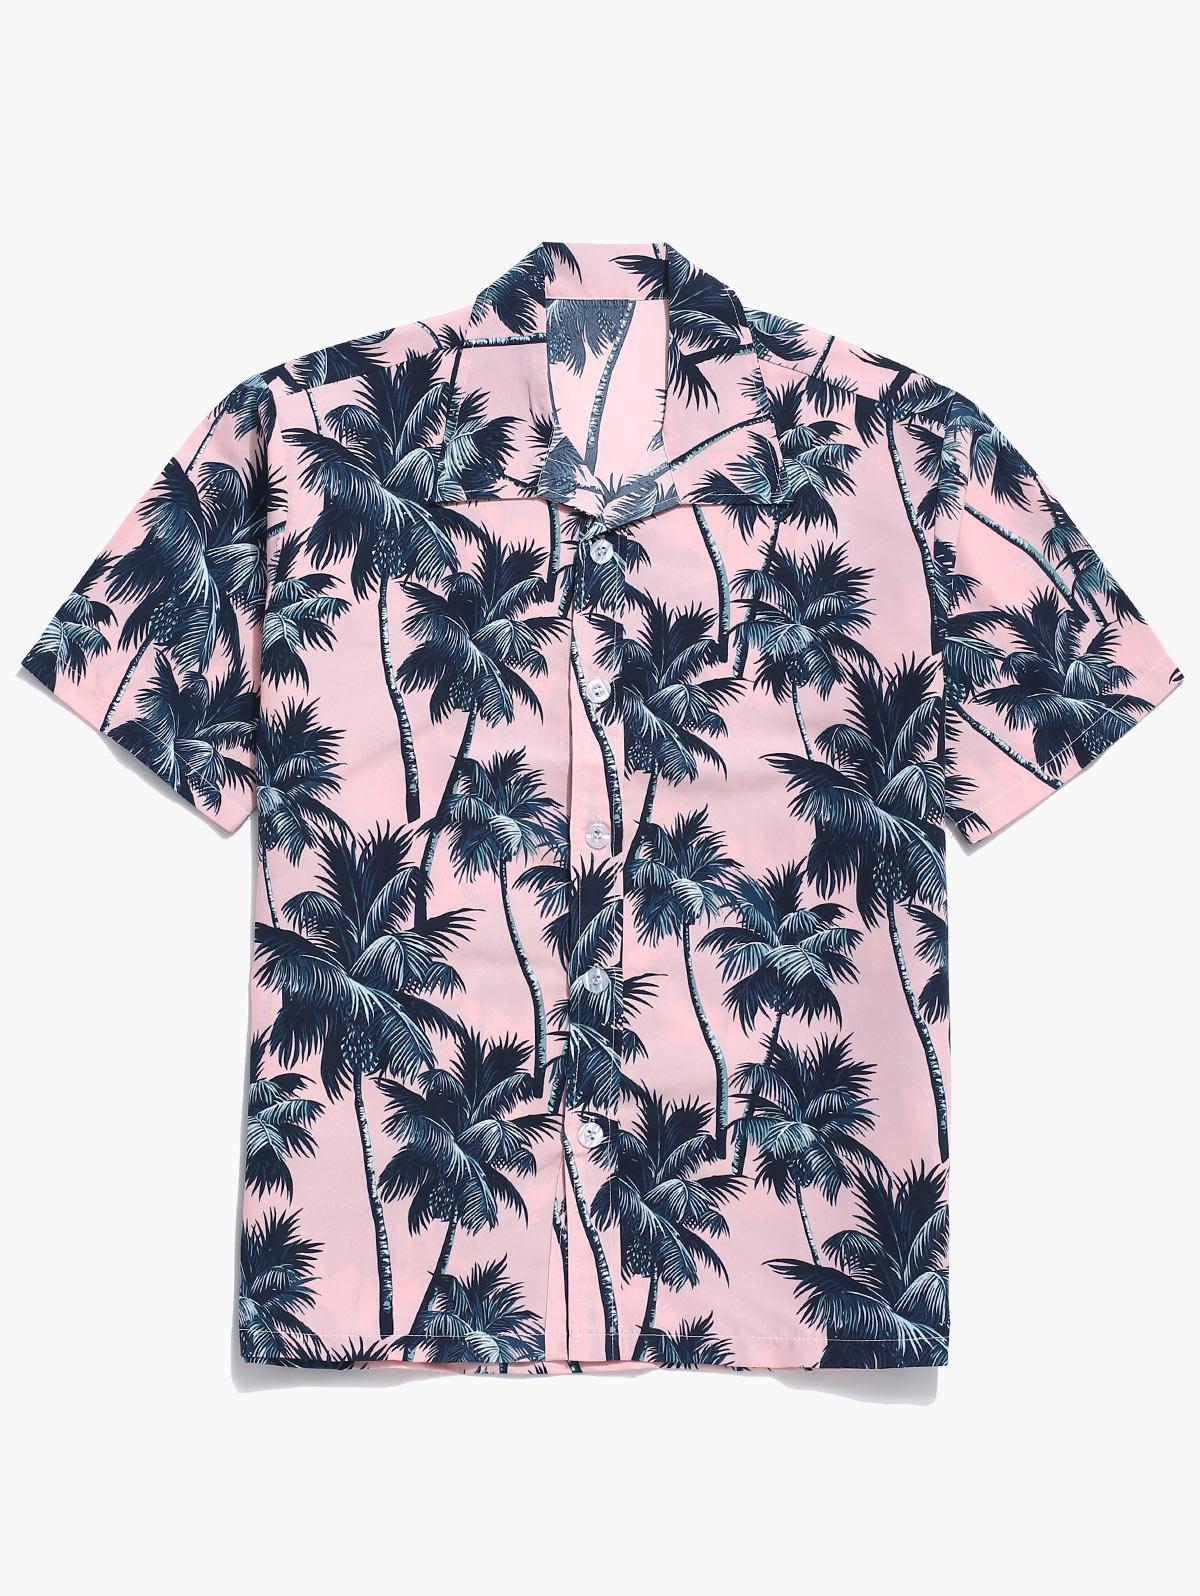 Palma Allover Print Hawaii Consiglio Shirt